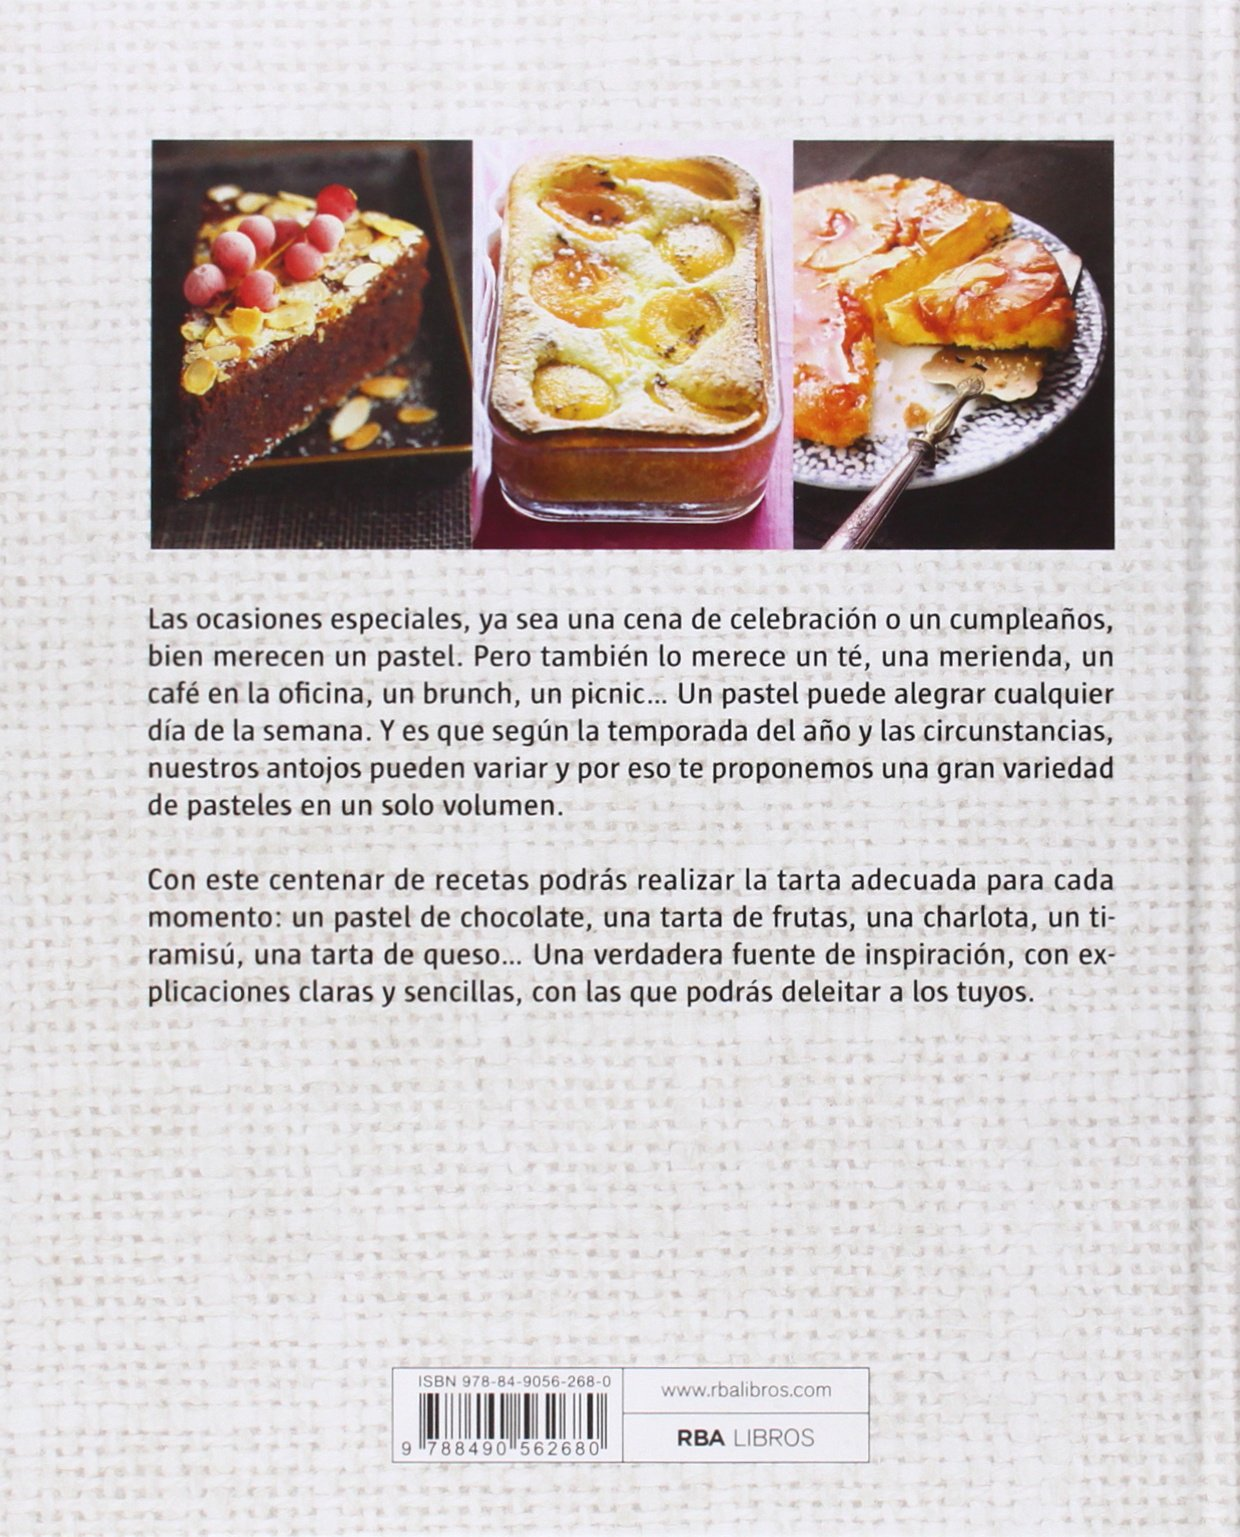 Tartas y bizcochos caseros: CATHERINE MADANI: 9788490562680: Amazon.com: Books